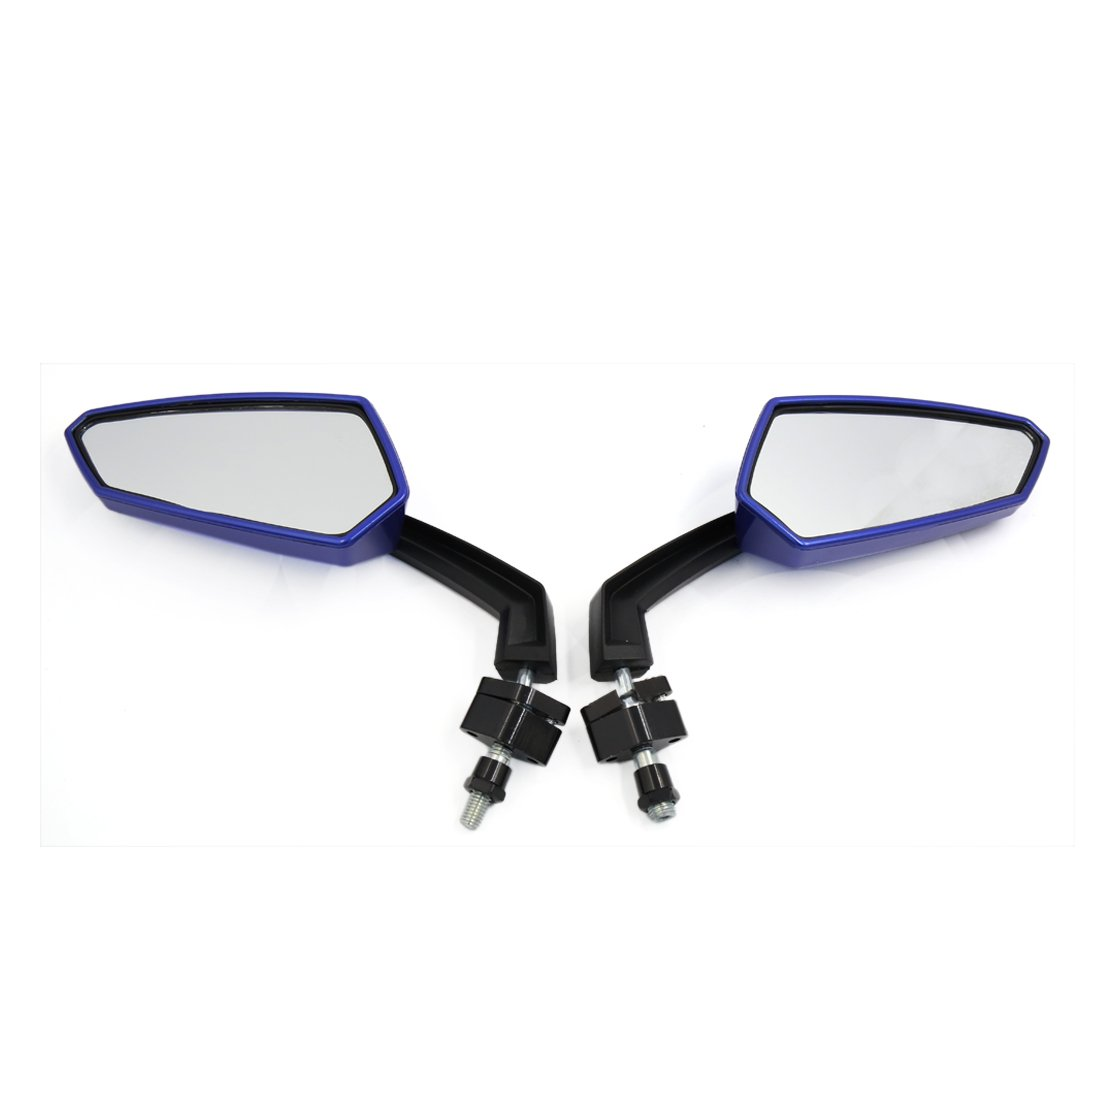 Sourcingmap Moto 10mm 8mm Negro Azul Pol/ígono Espejo Retrovisor /Ángulo Ajustable